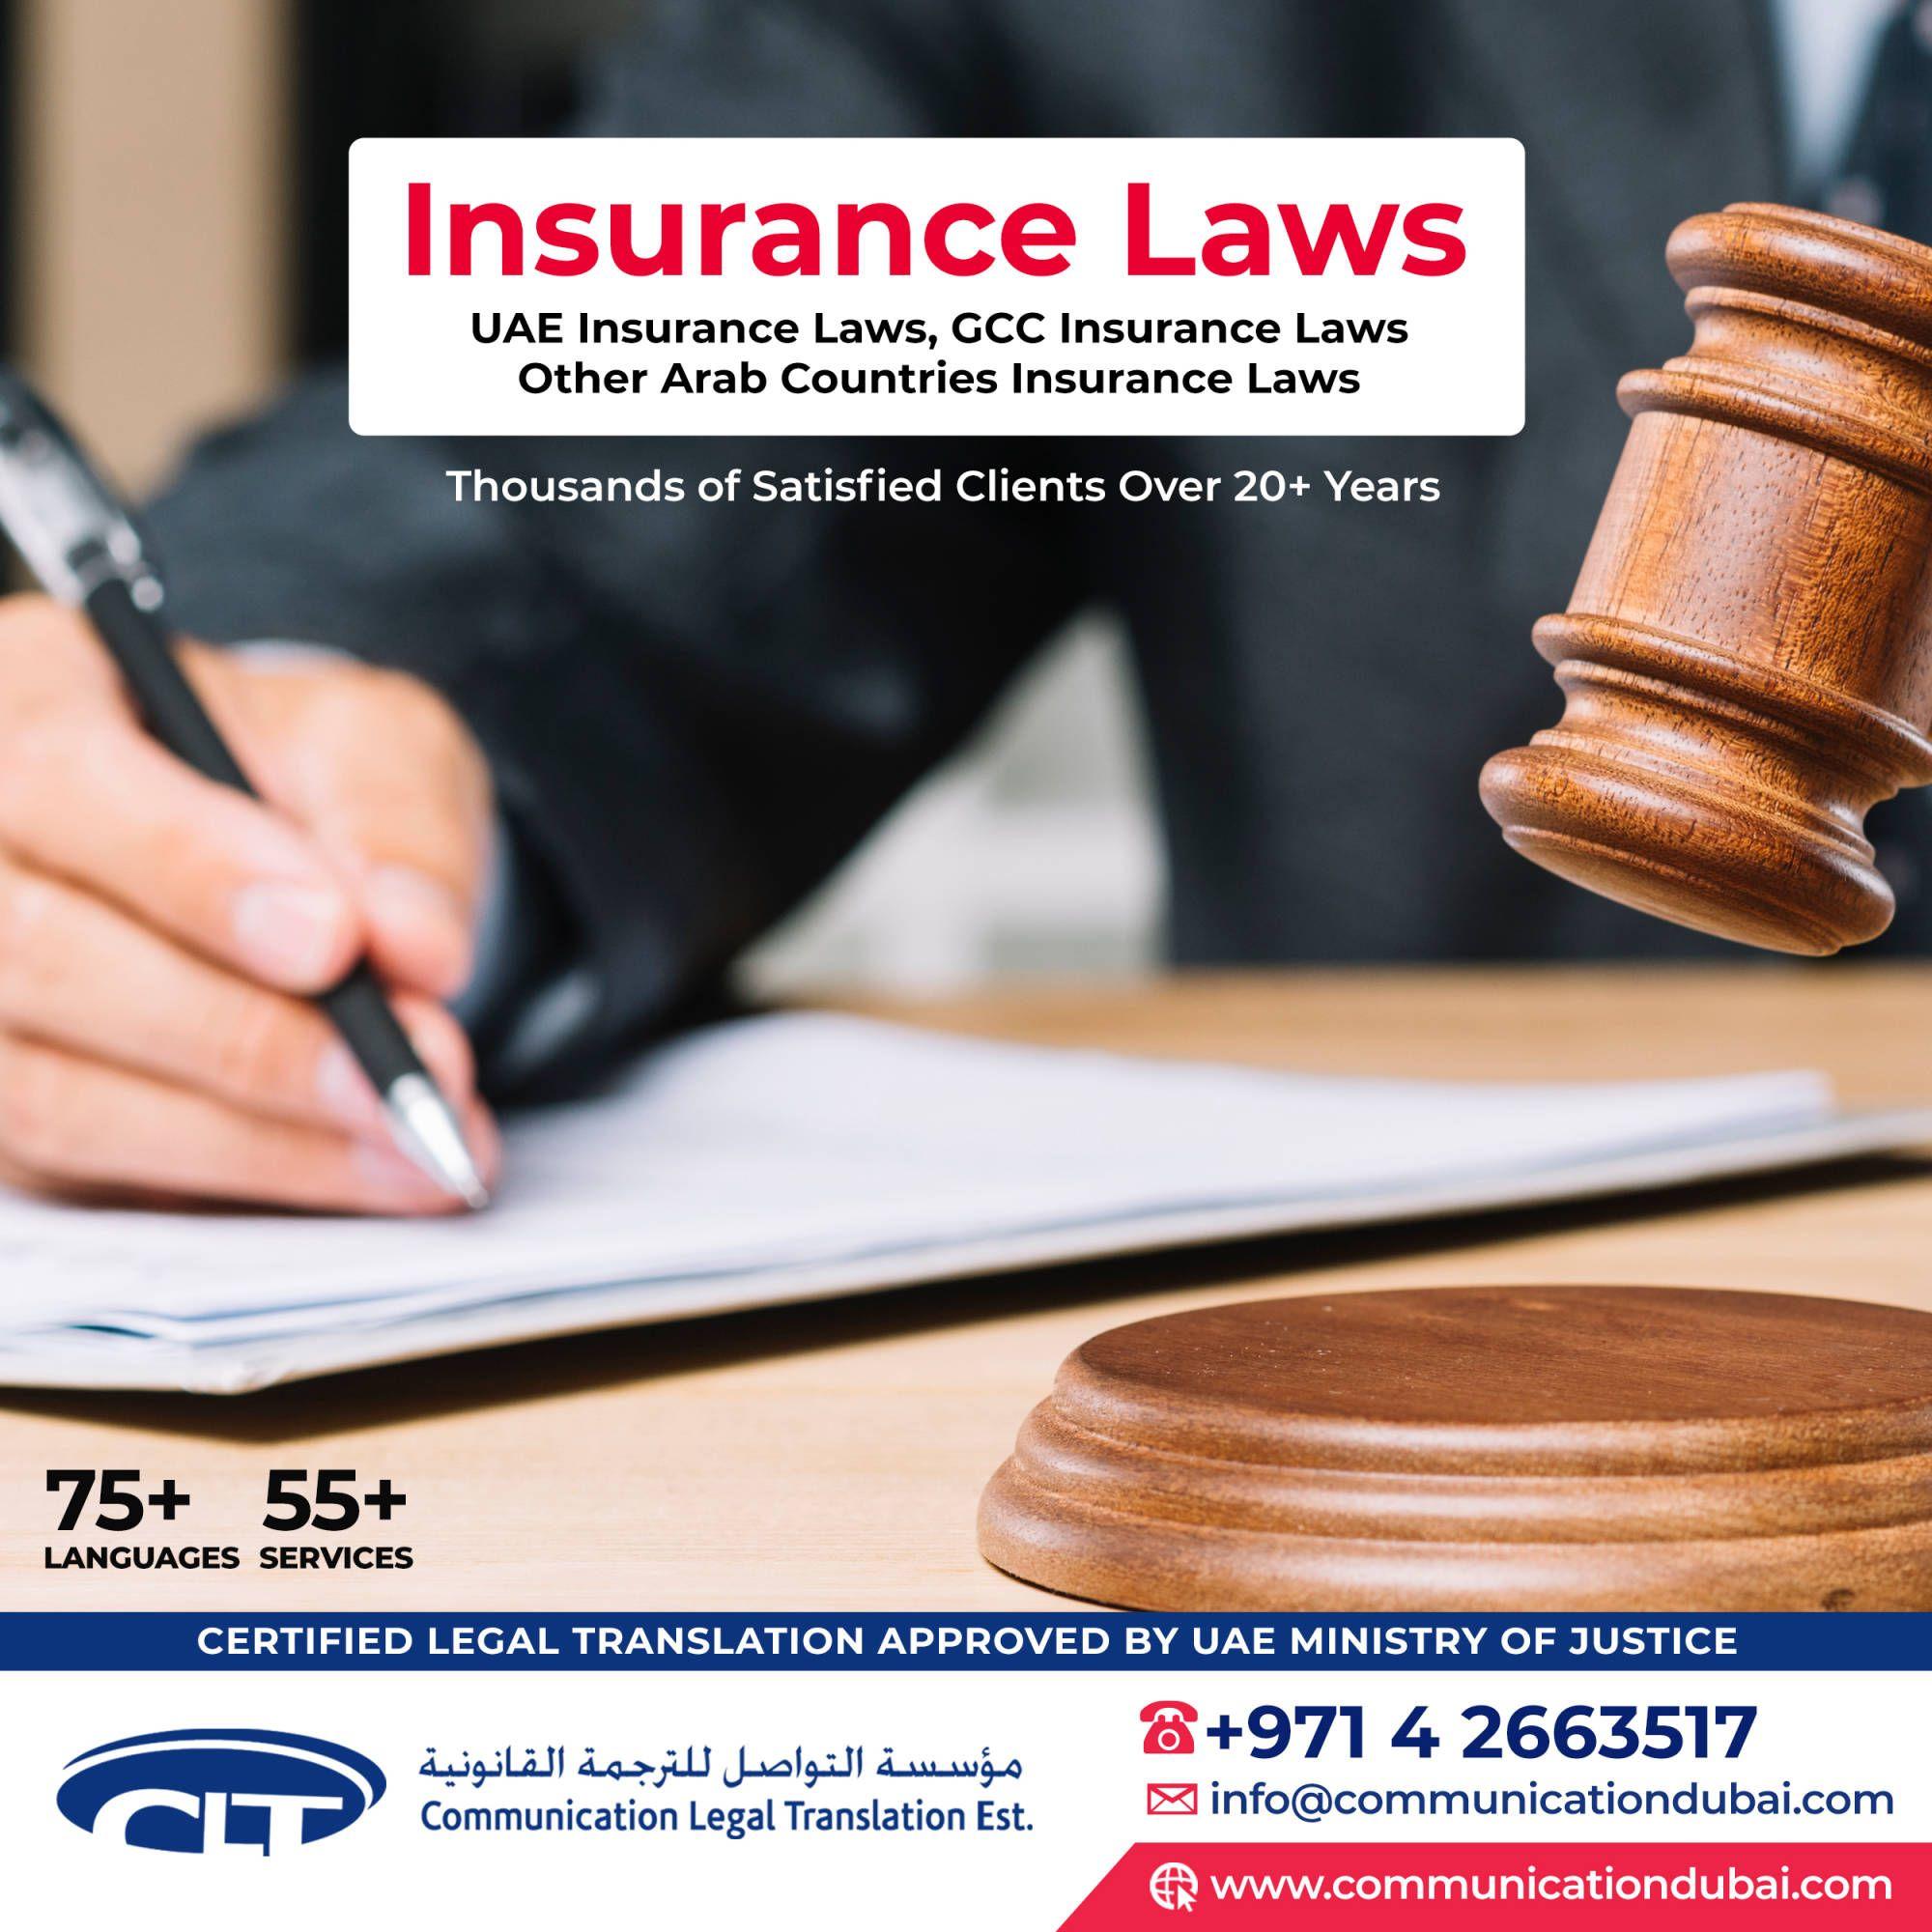 Insurance Laws Https Communicationdubai Com Laws Insurance Laws